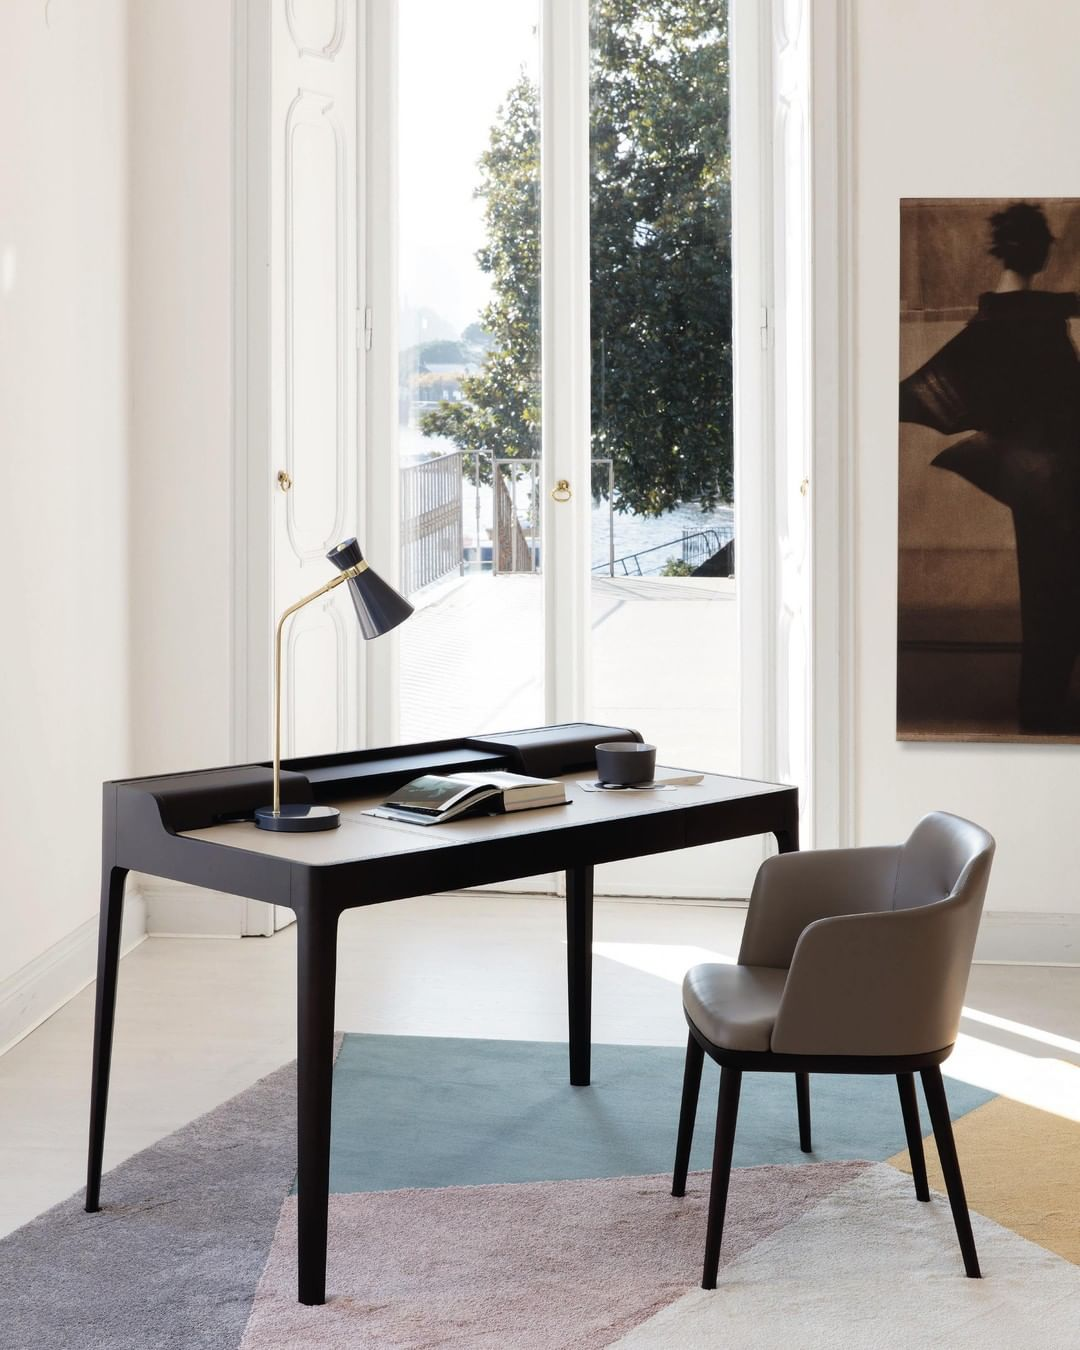 oficina con silla cómoda